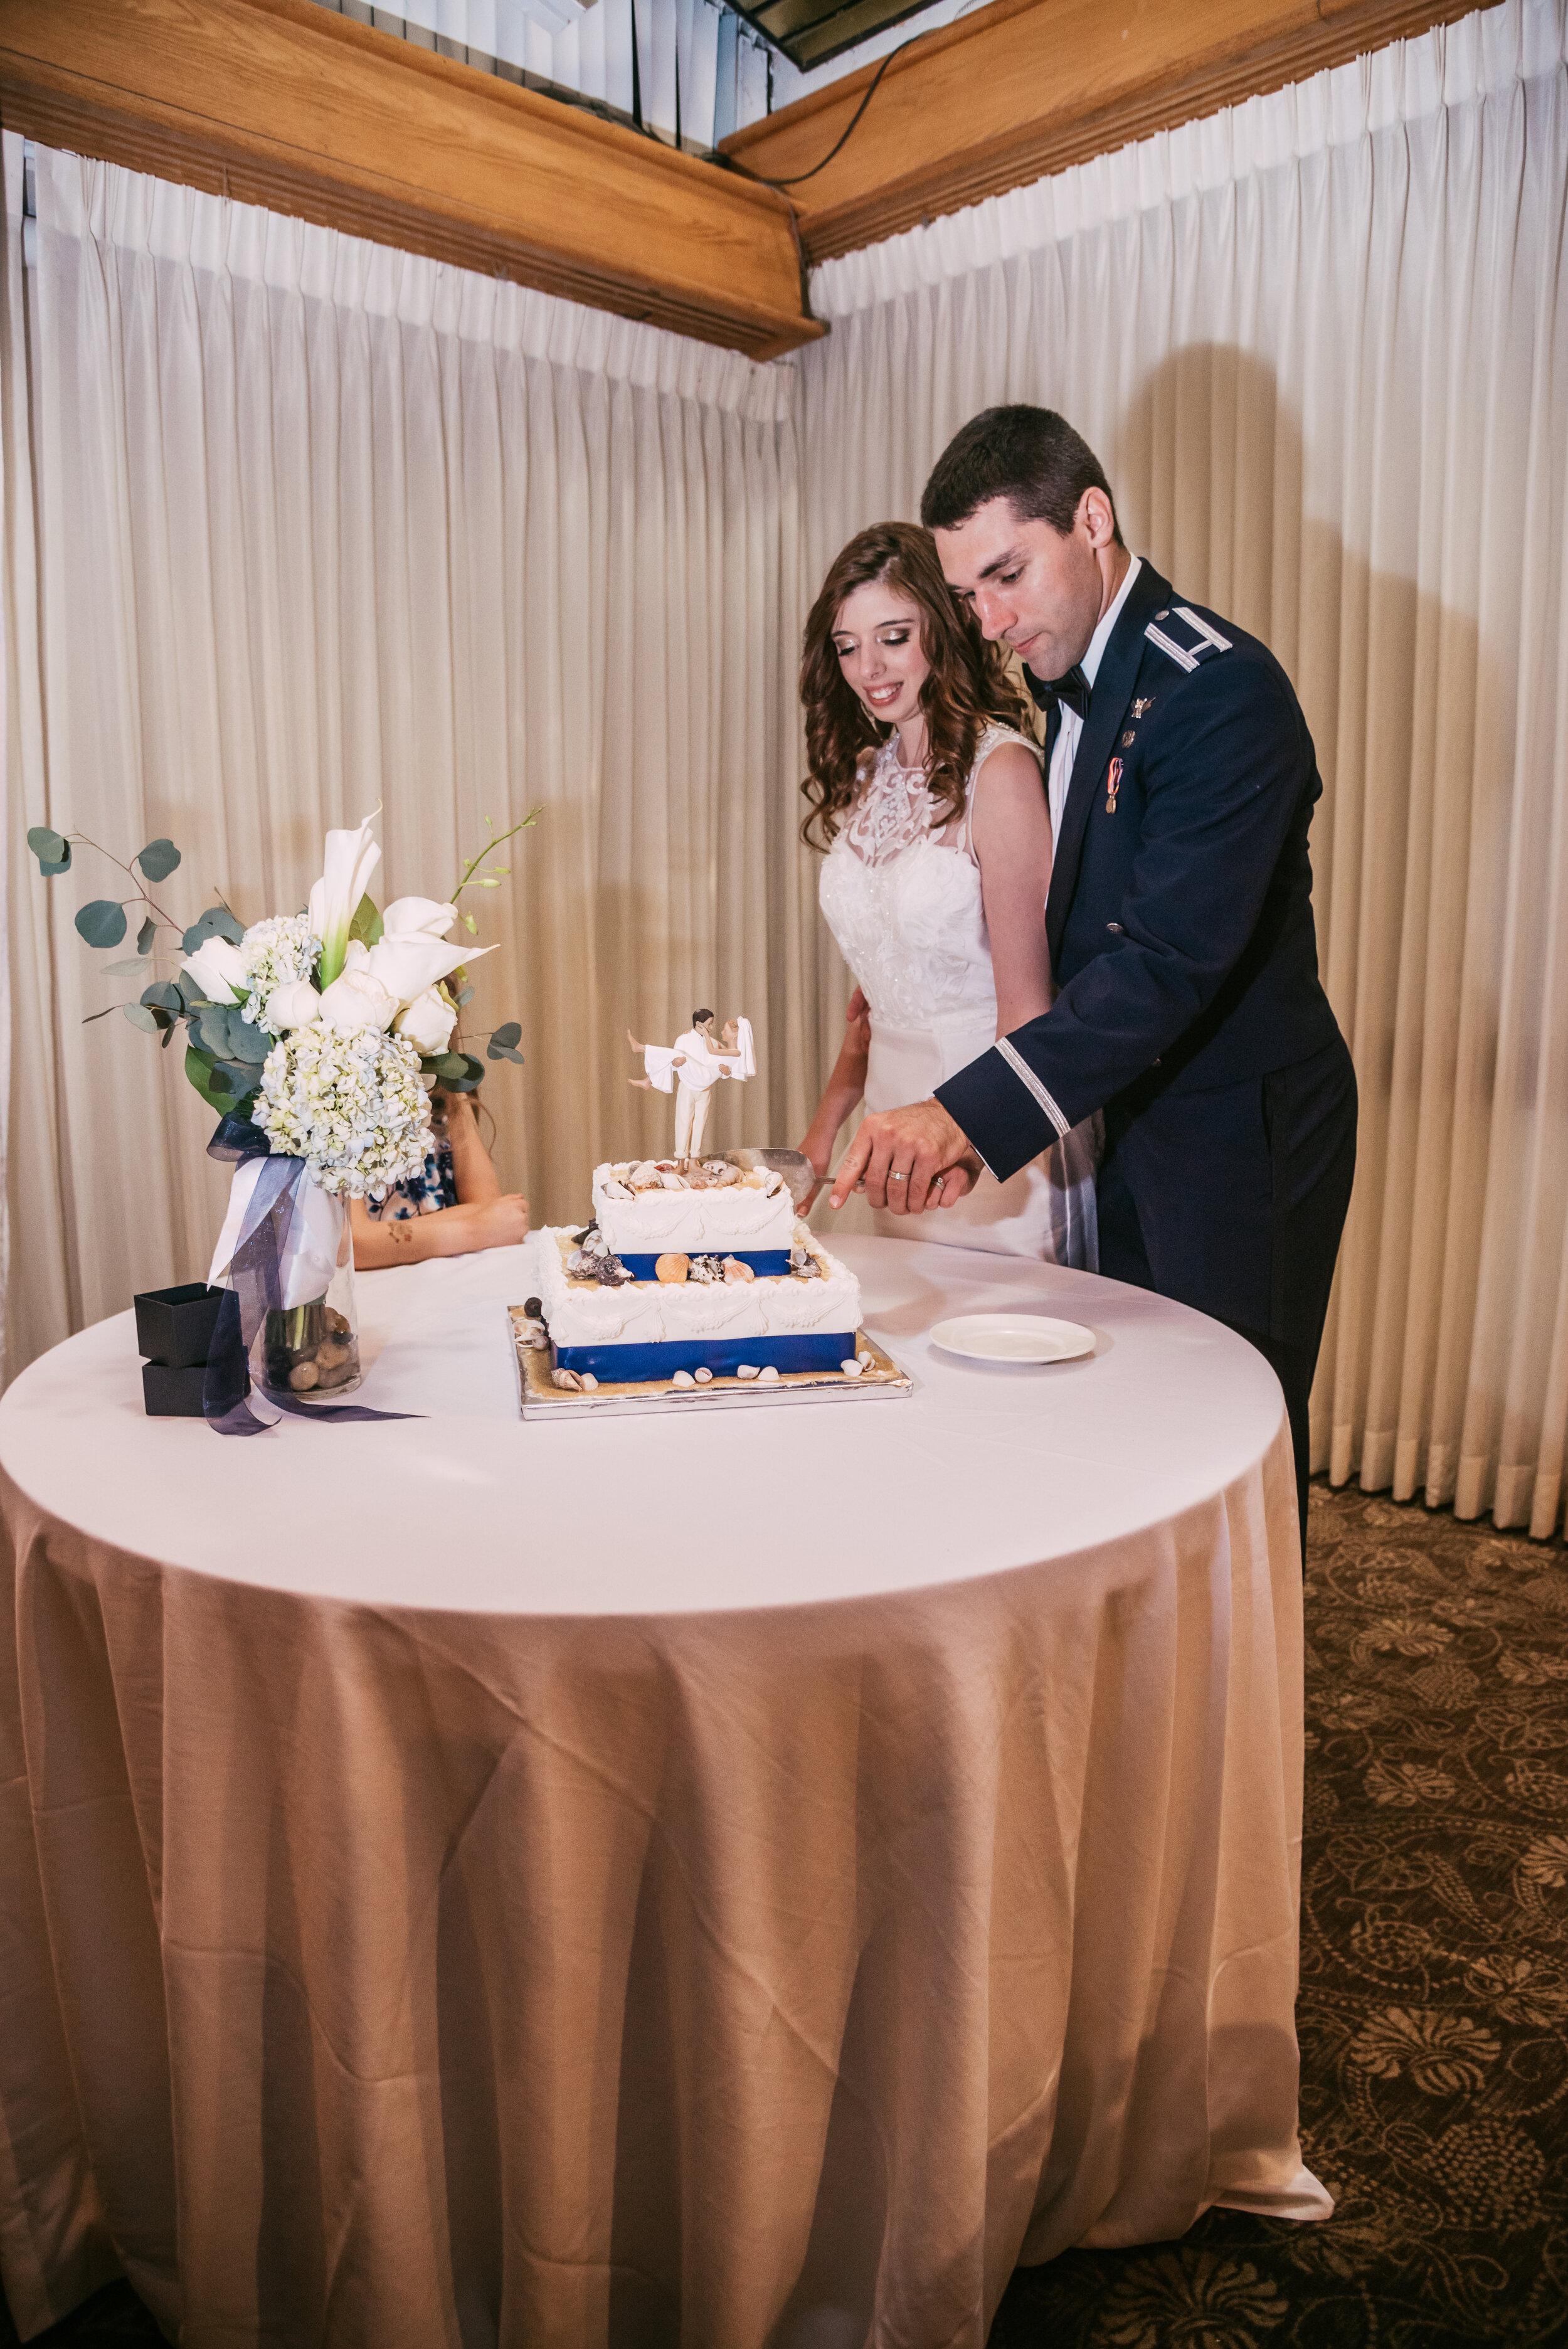 andru-the-tide-club-air-force-wedding-patrickafb-1-147.jpg